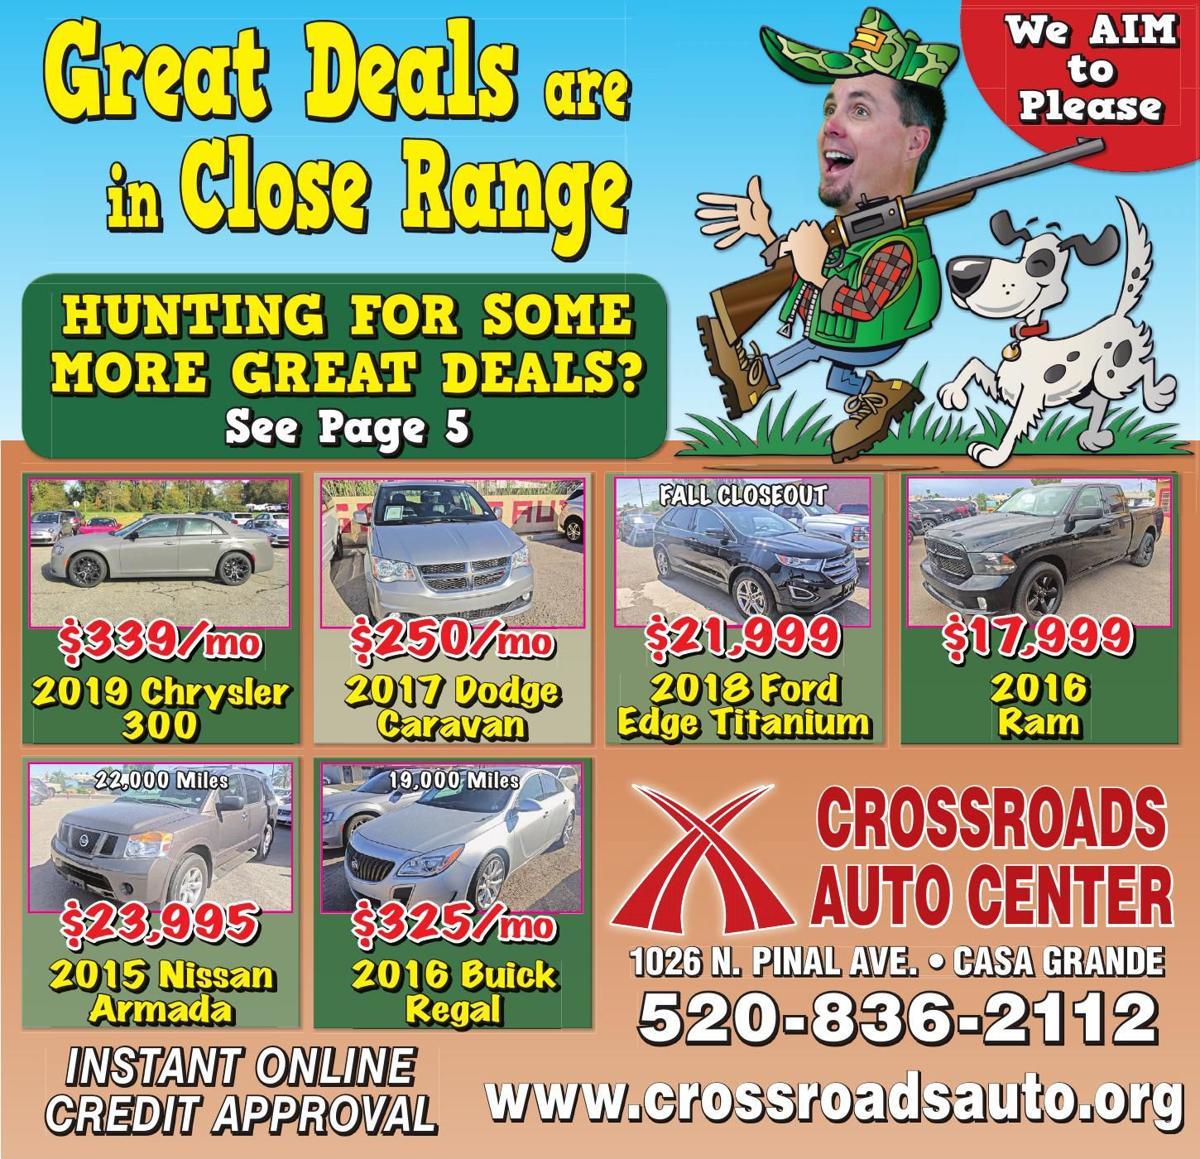 Crossroads Auto Center